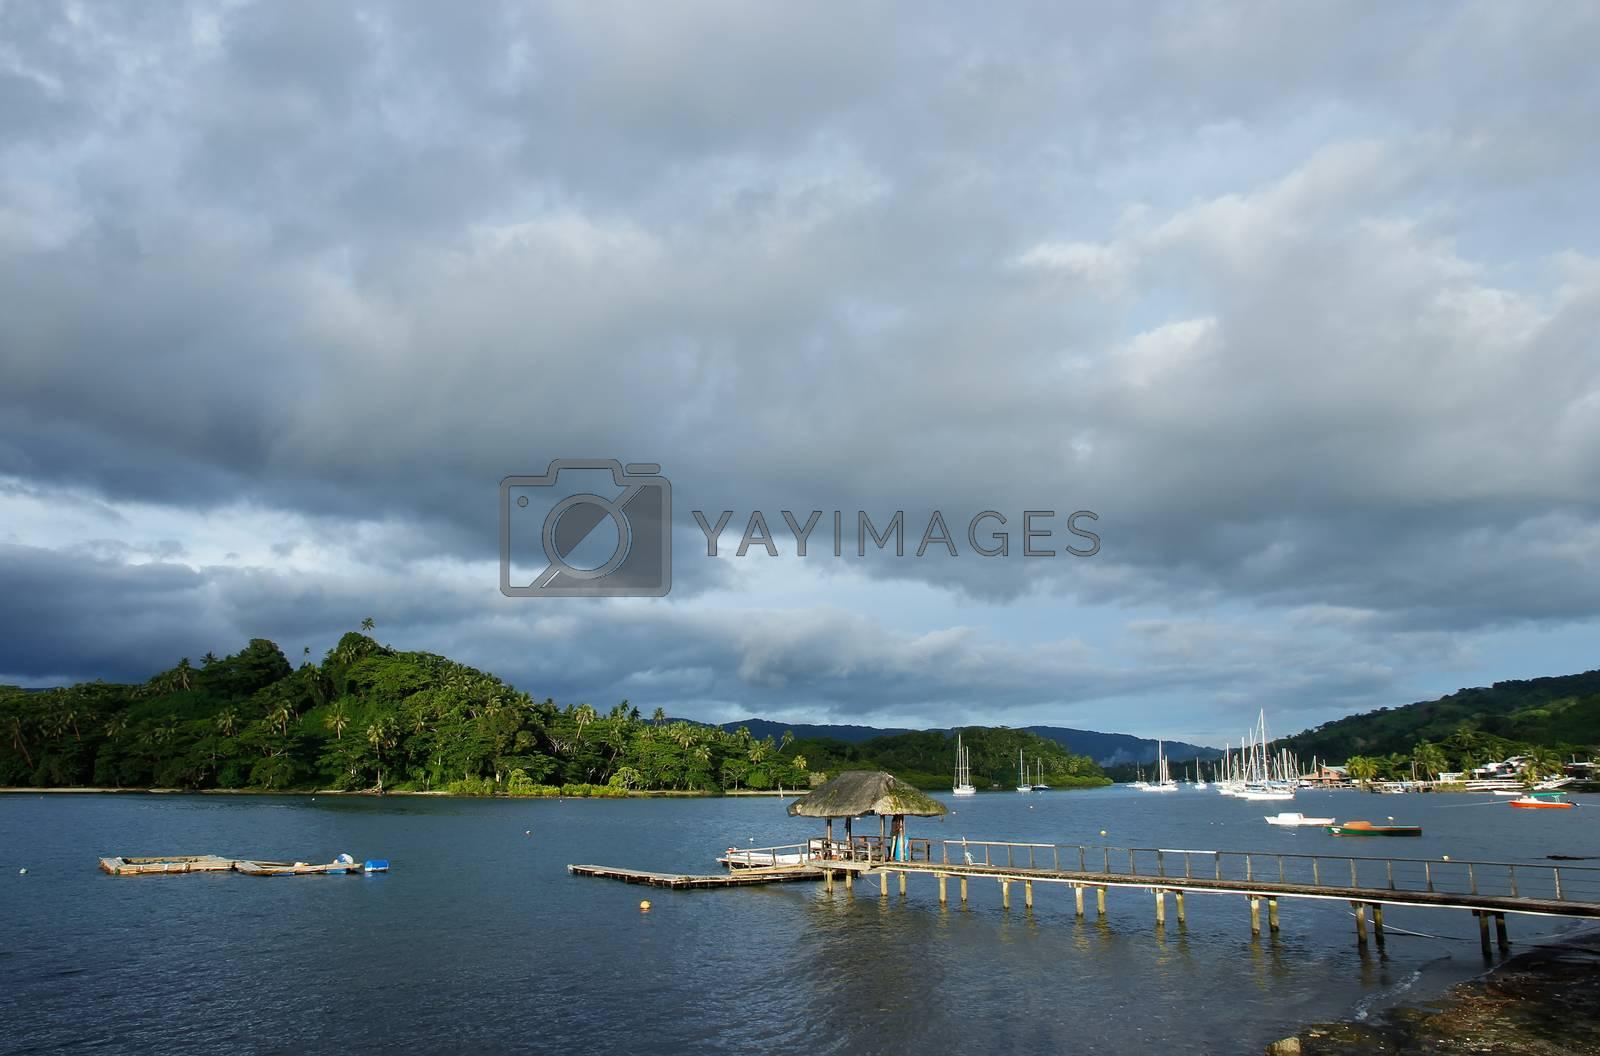 Royalty free image of Wooden pier at Savusavu harbor, Vanua Levu island, Fiji by donya_nedomam